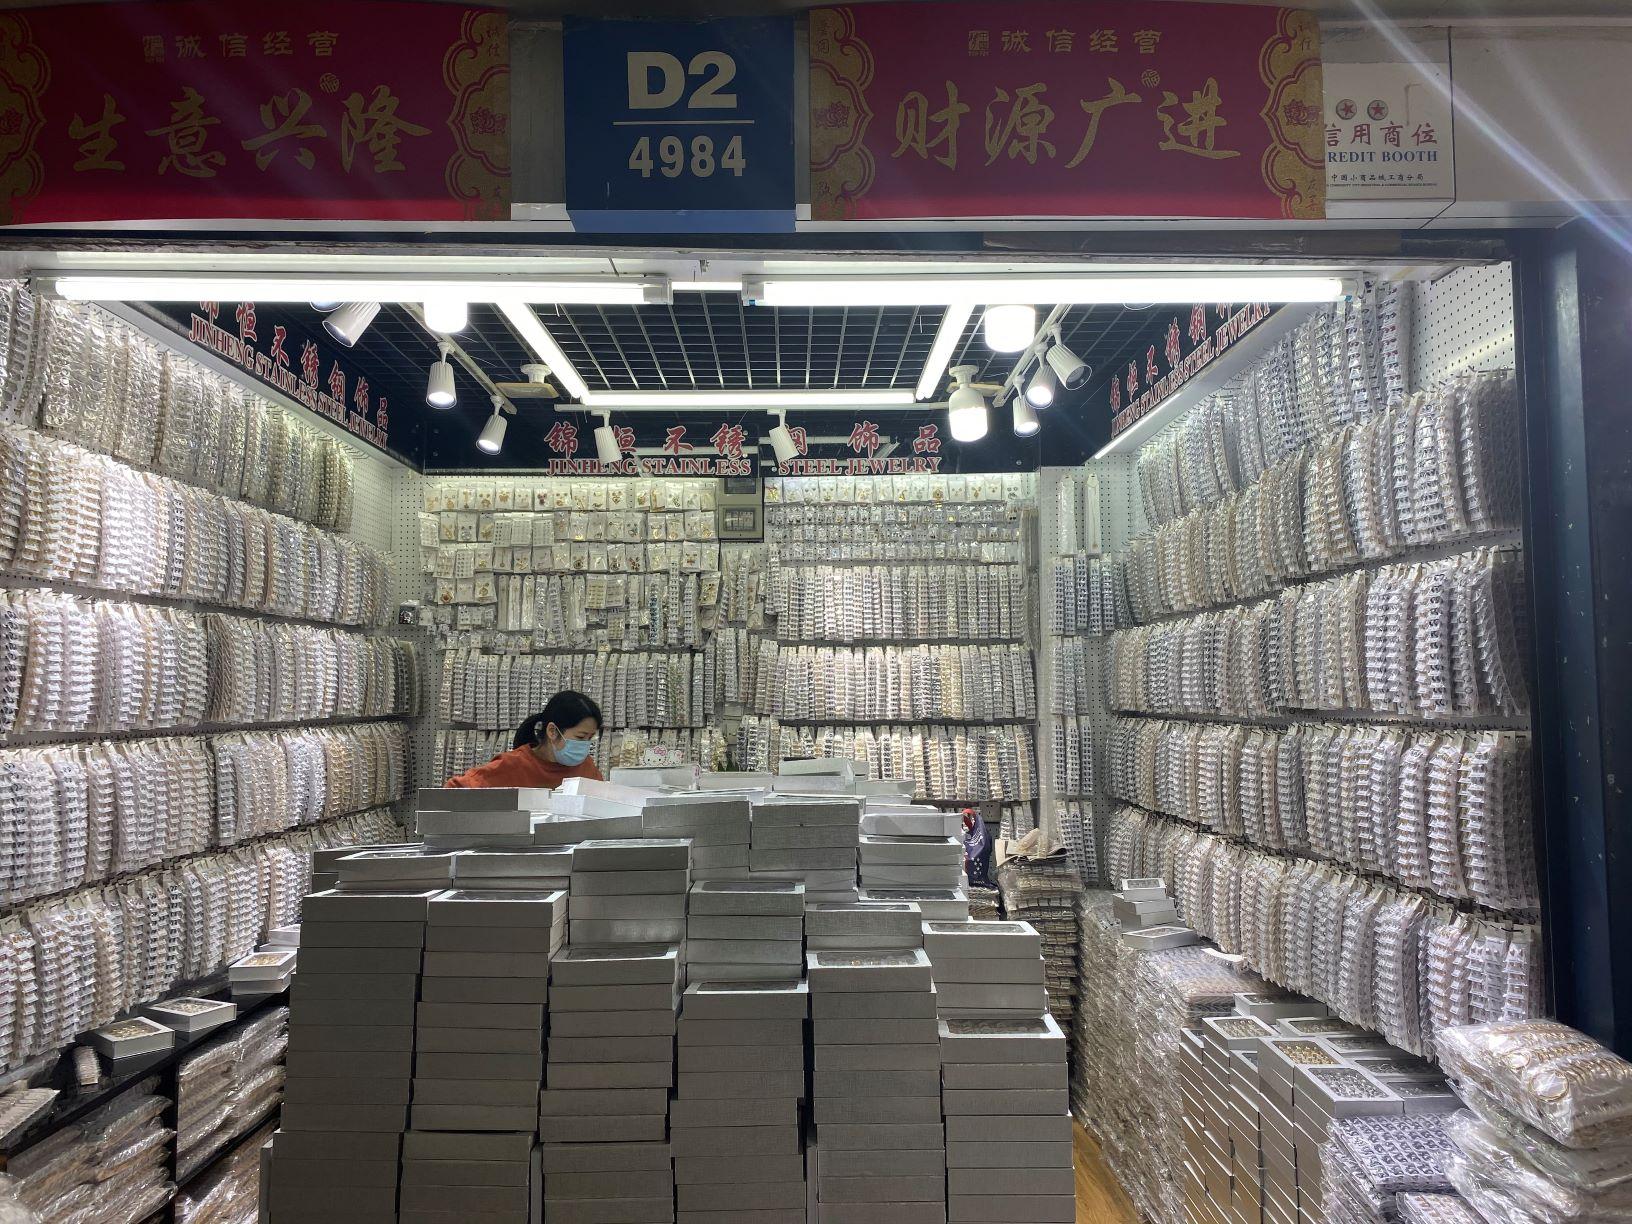 SS (stainless steel) jewelry wholesaler LLSS010